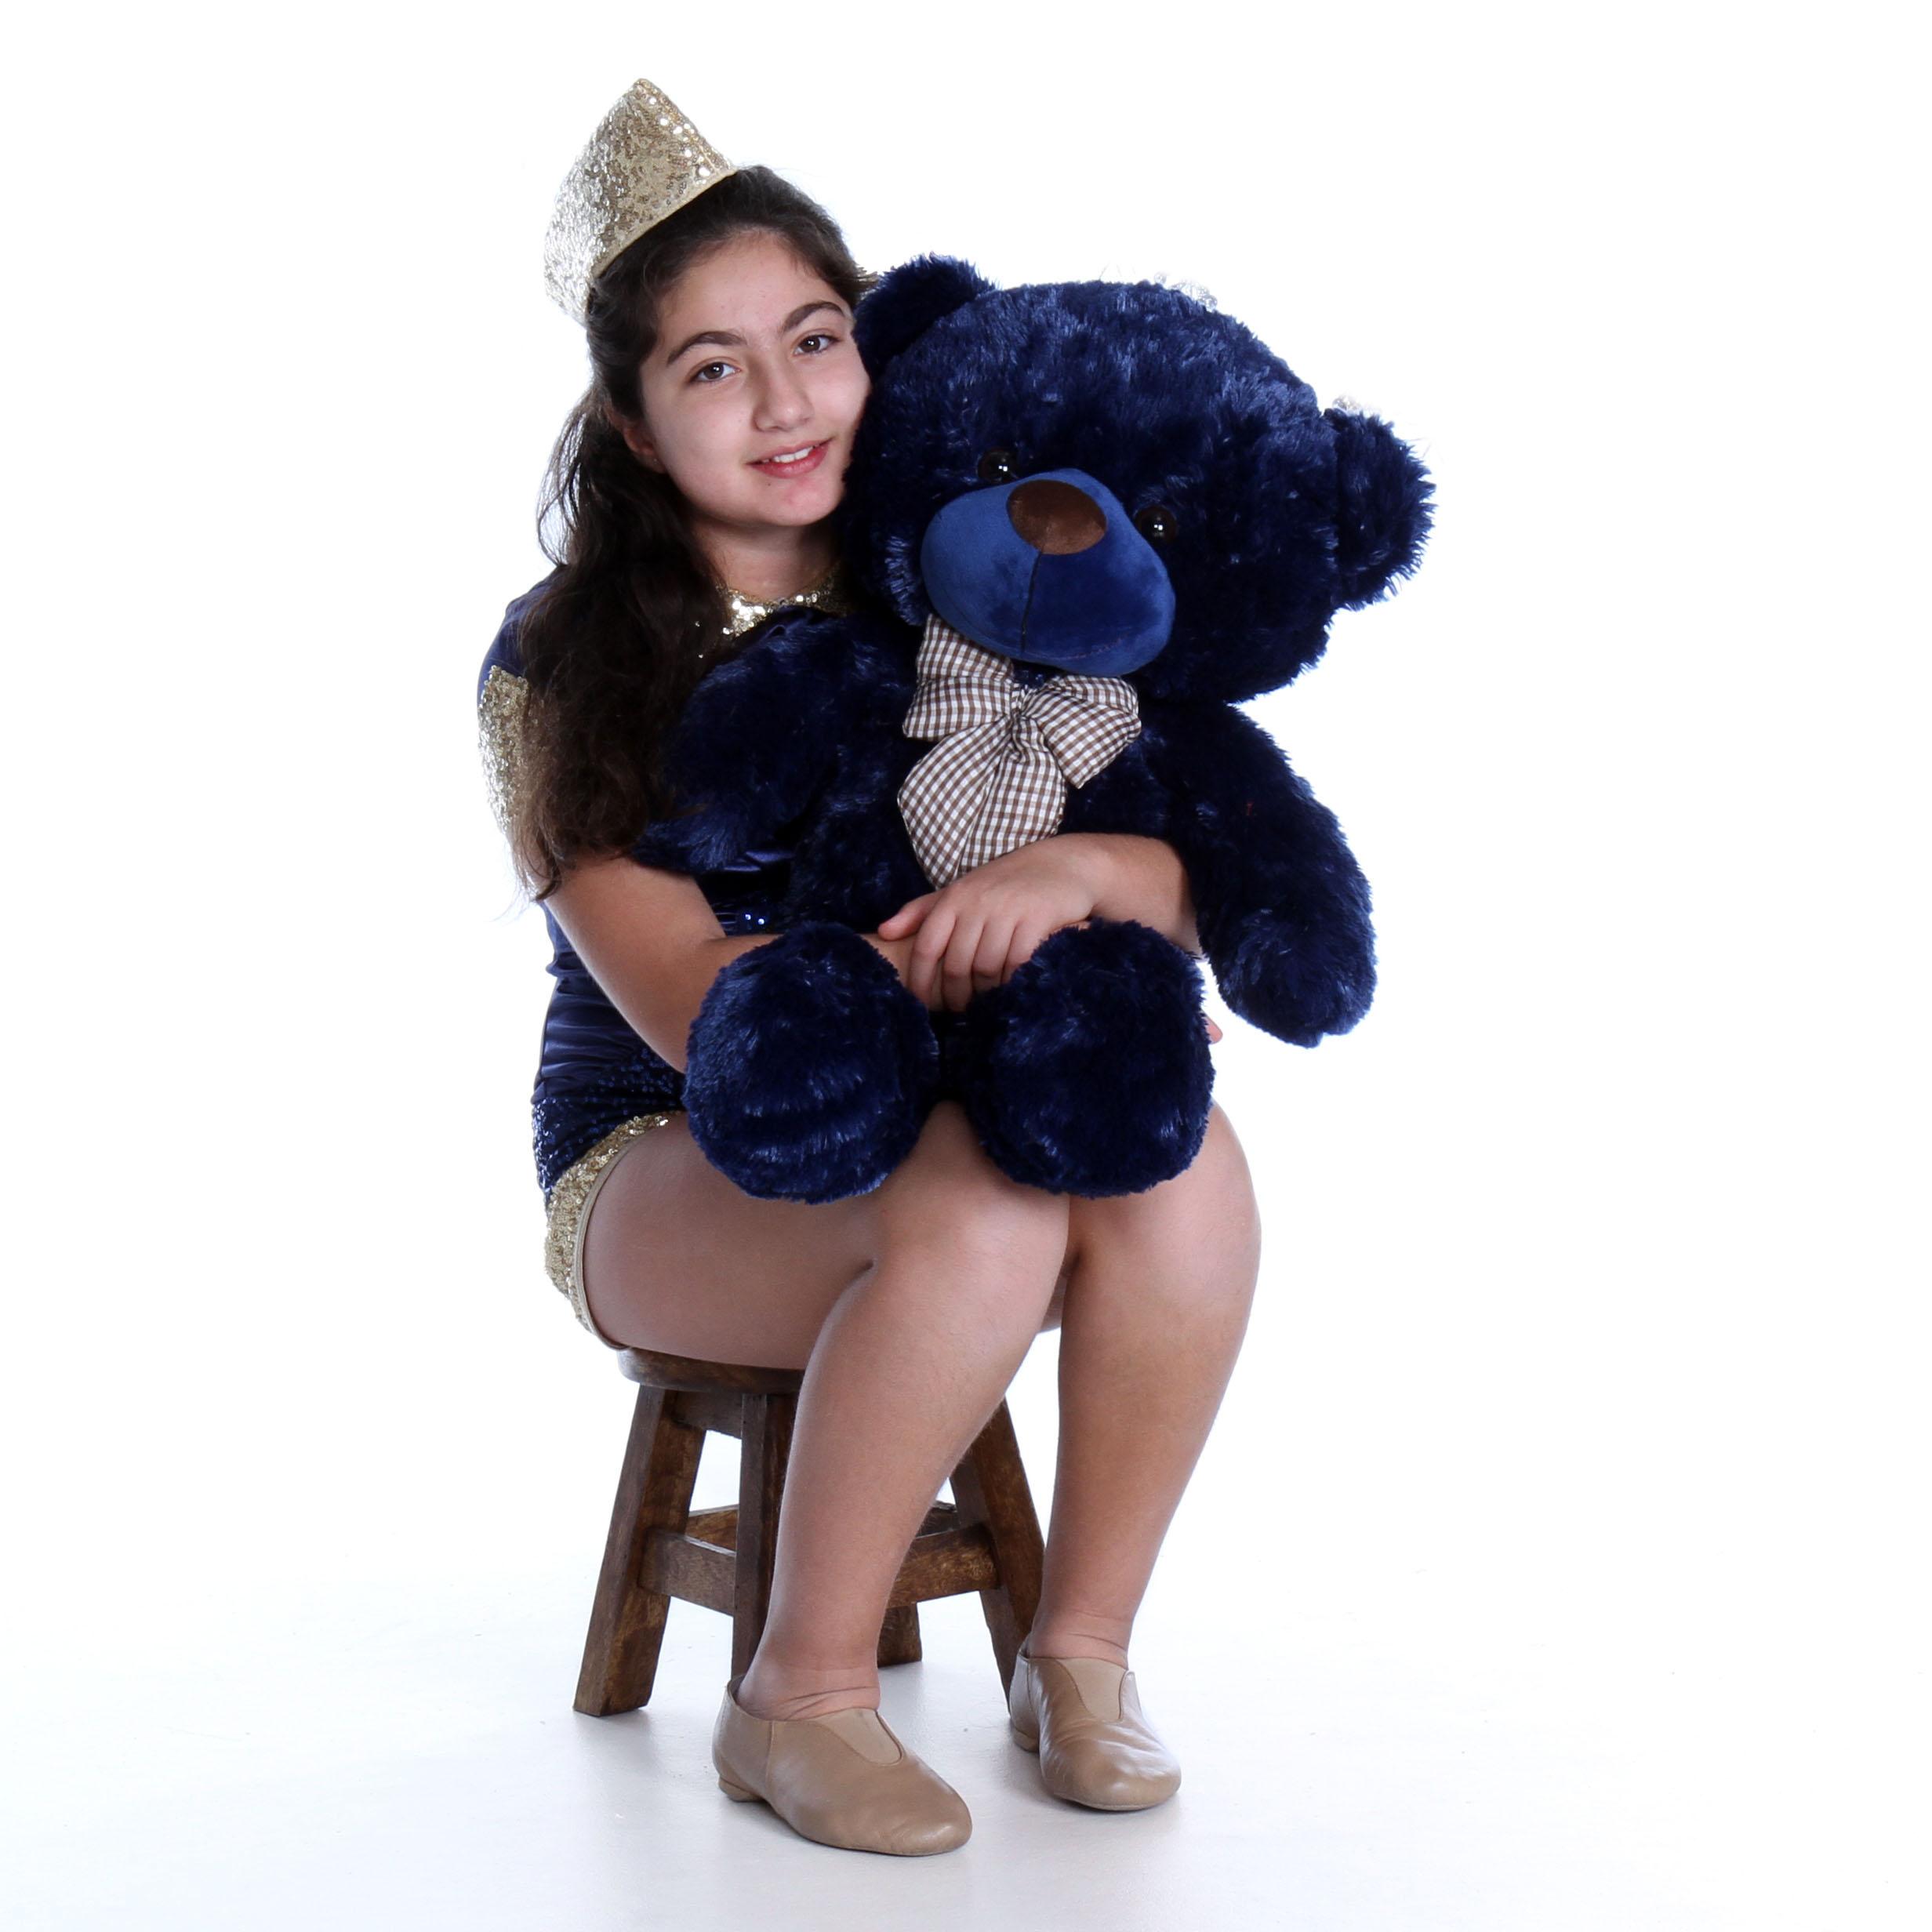 30in-huggable-navy-blue-teddy-bear-royce-cuddles.jpg